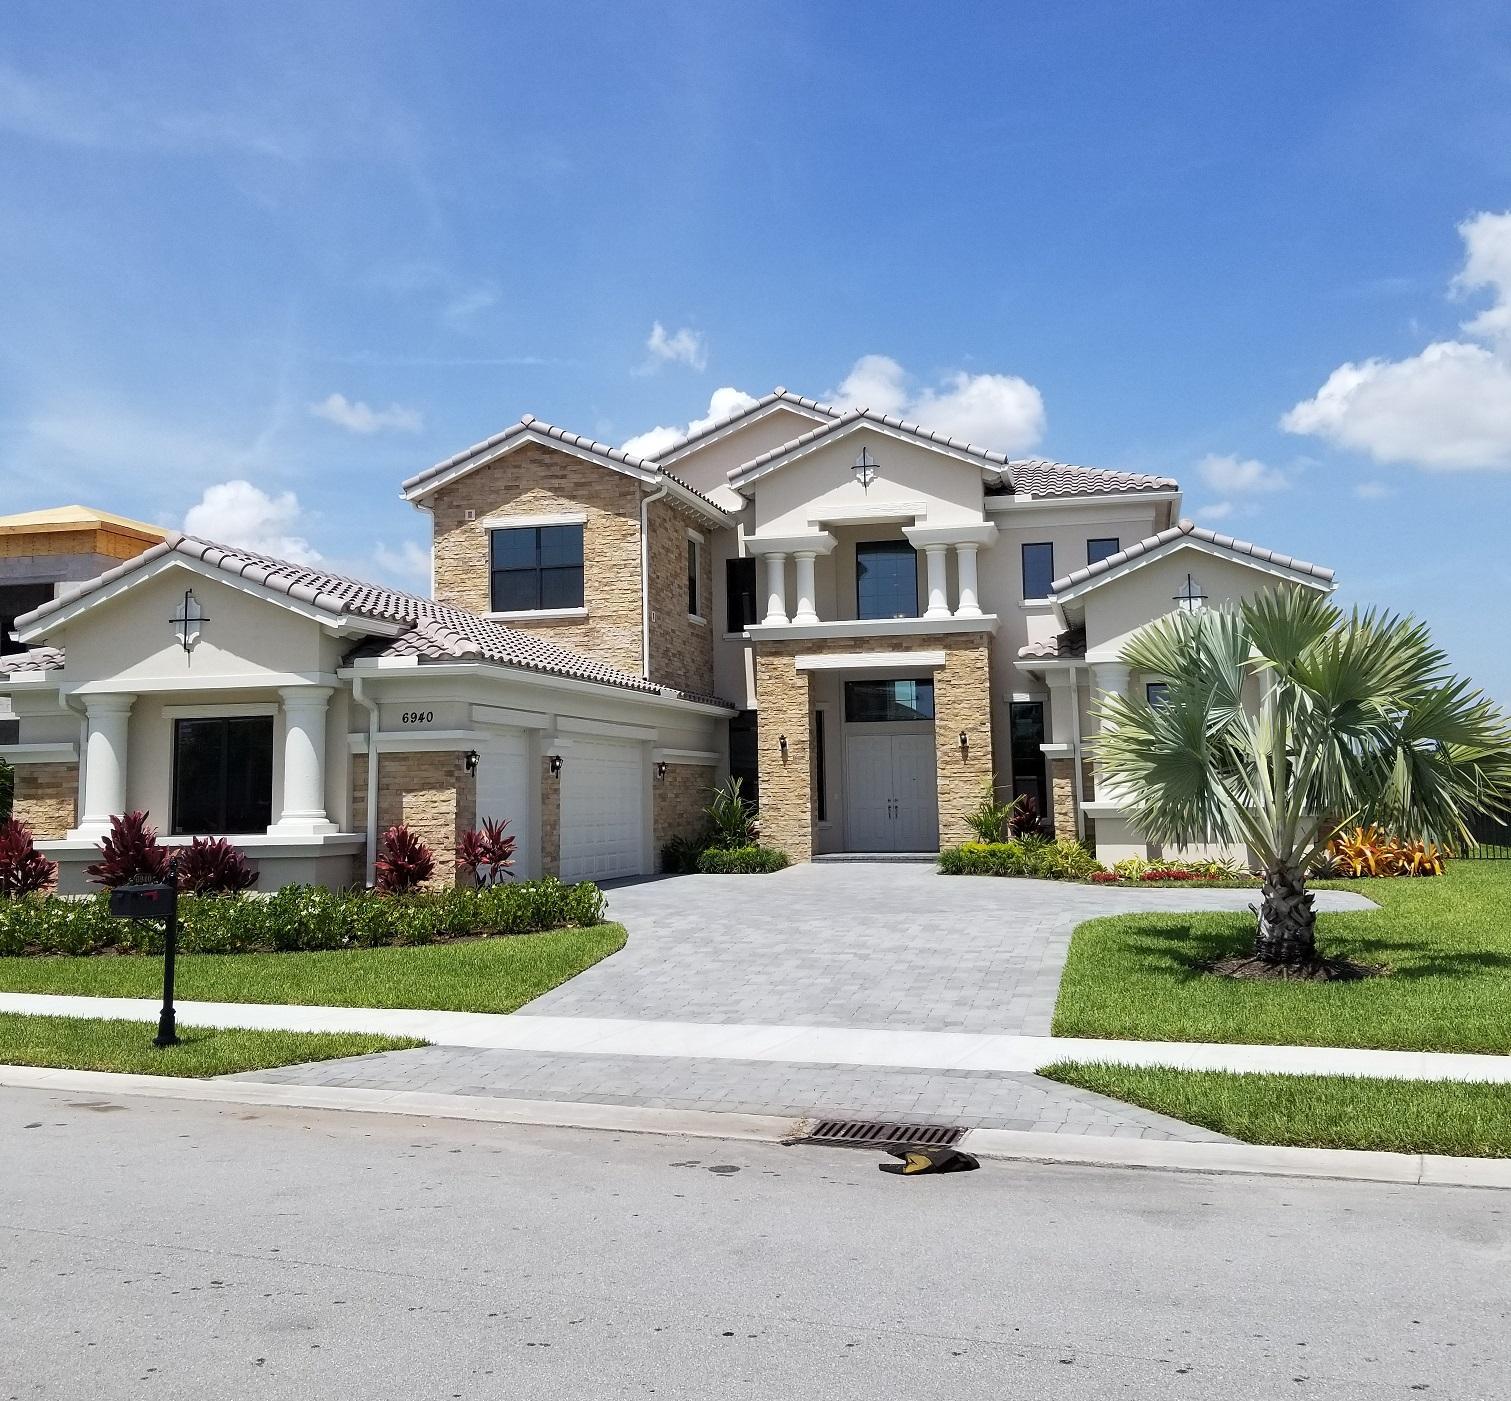 6940 NW 26th Way  Boca Raton FL 33496